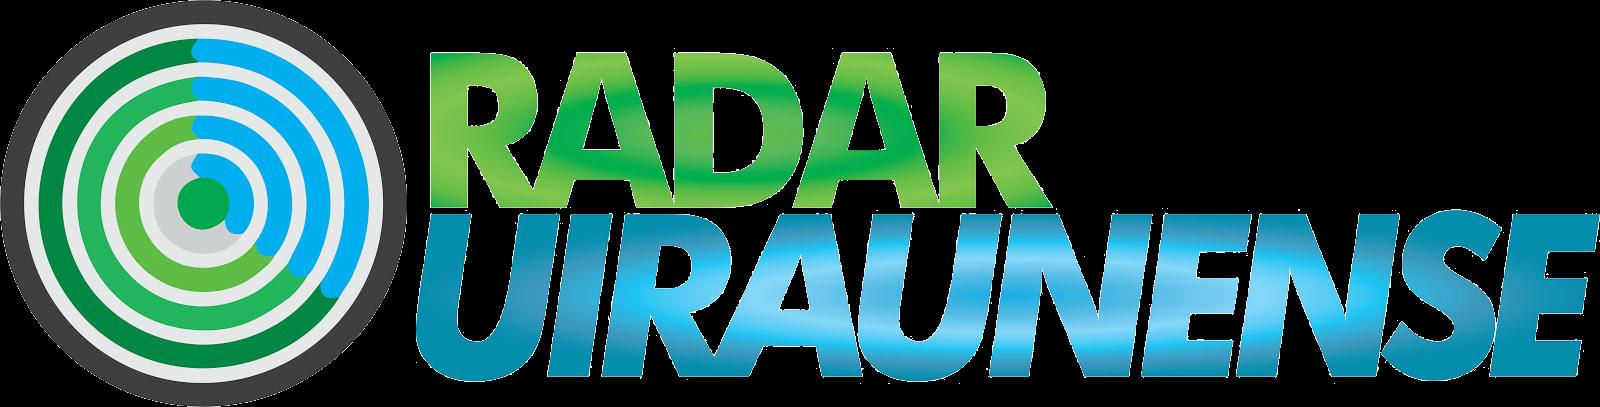 Radar Uiraunense